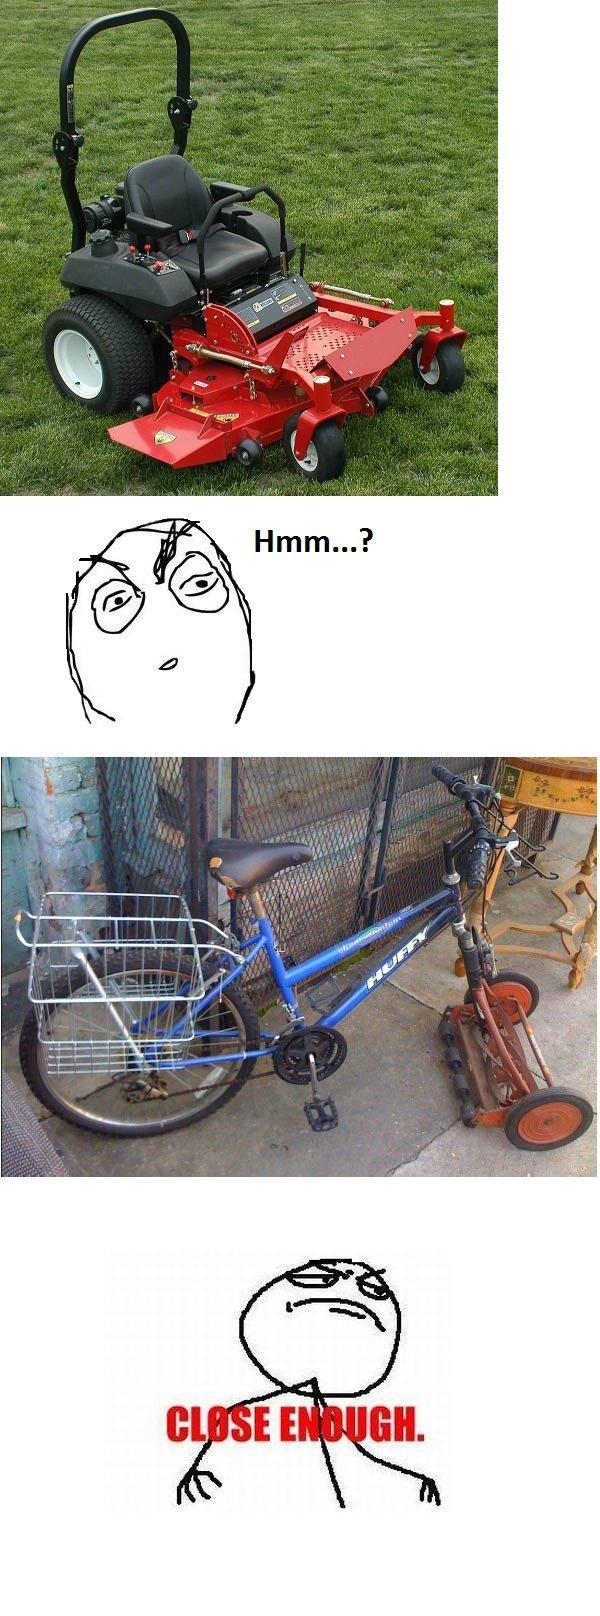 Lawn mowers. .. that bike is pretty badass if you ask me close enough lawn mower